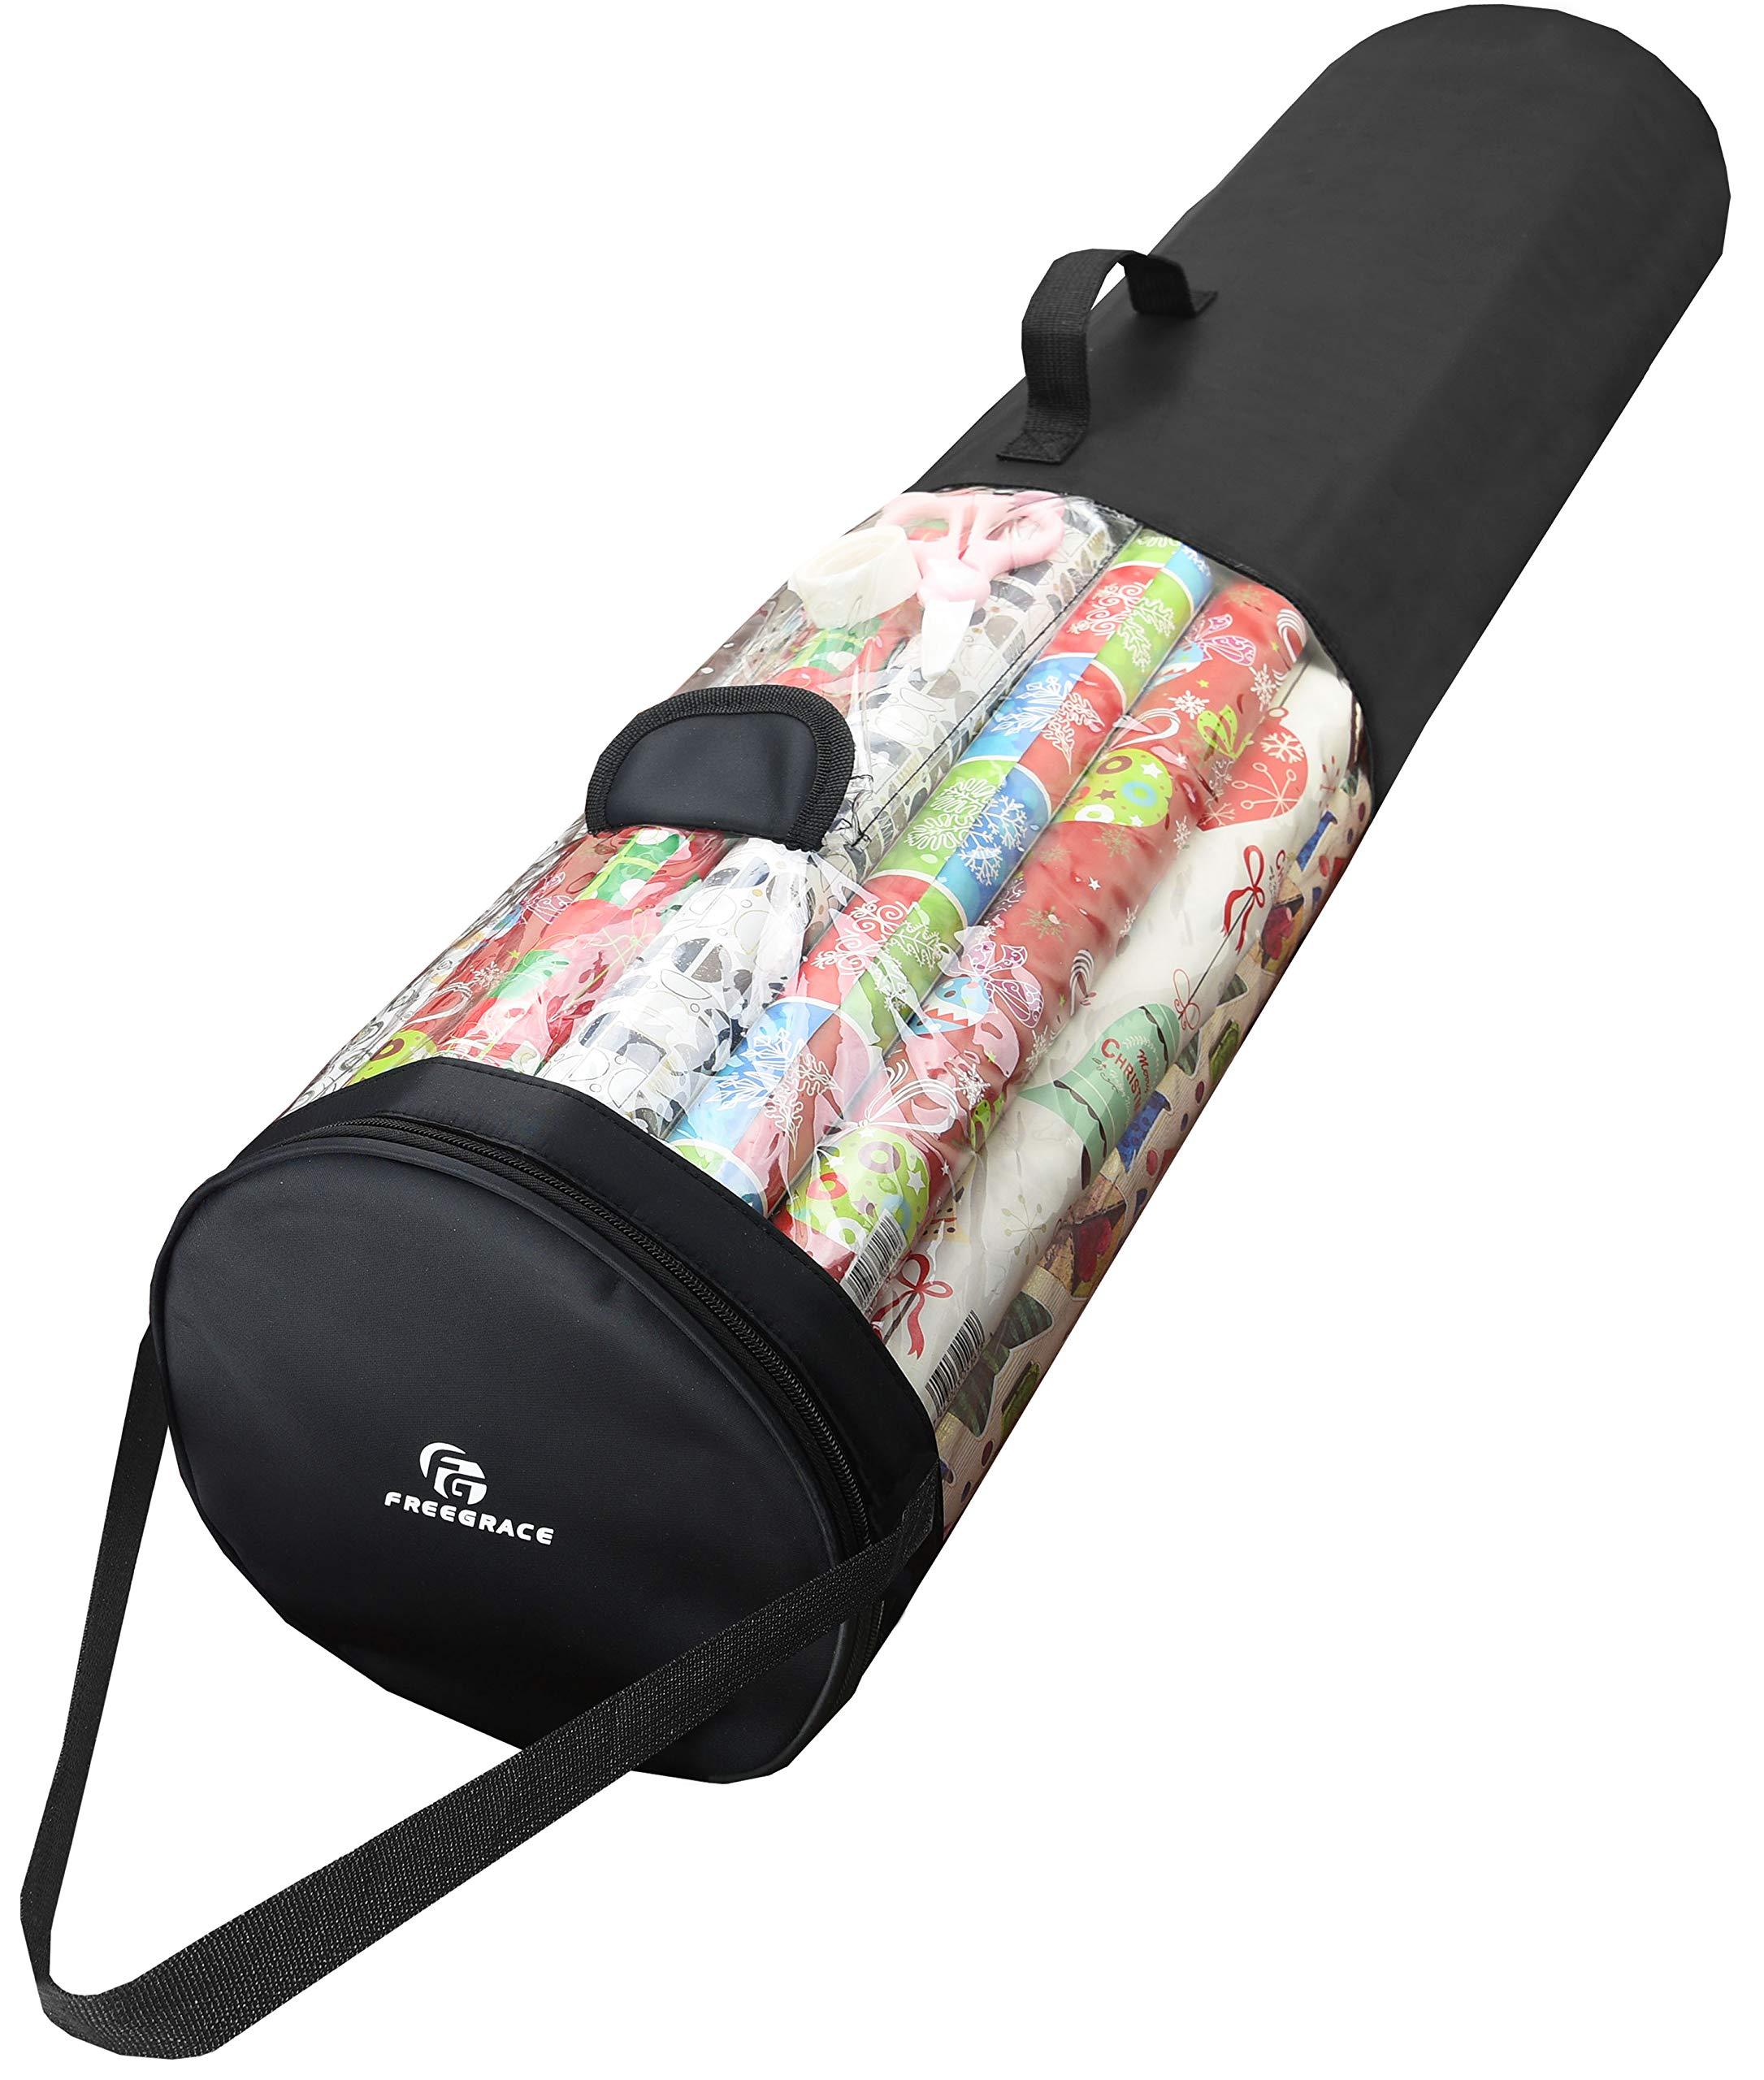 "Freegrace Gift Wrap Organizer | Large 9"" x 40.9"" Wrapping Paper Rolls Storage Bag | Tearproof & Space Saving Under Bed Gift Bag Organization (Black)"